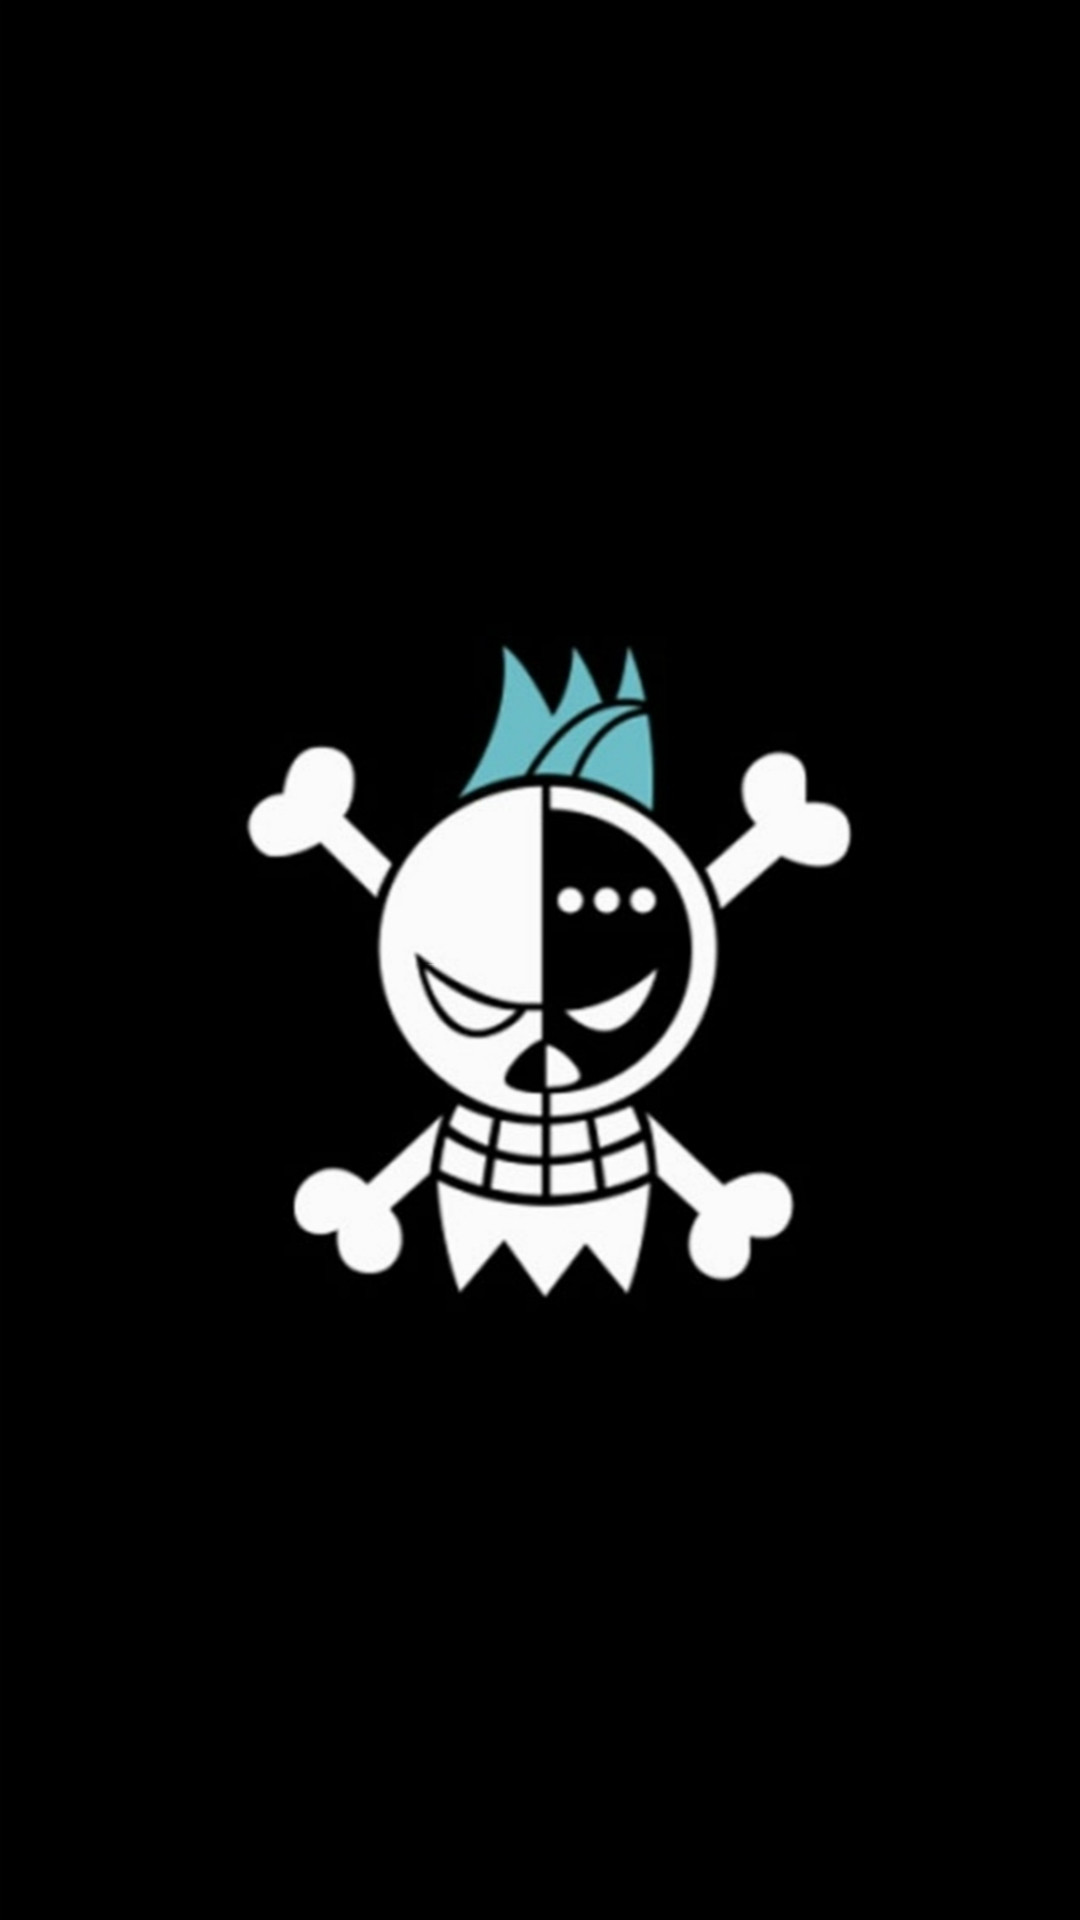 Fun Pirate Skull Logo Pattern iPhone 6 wallpaper